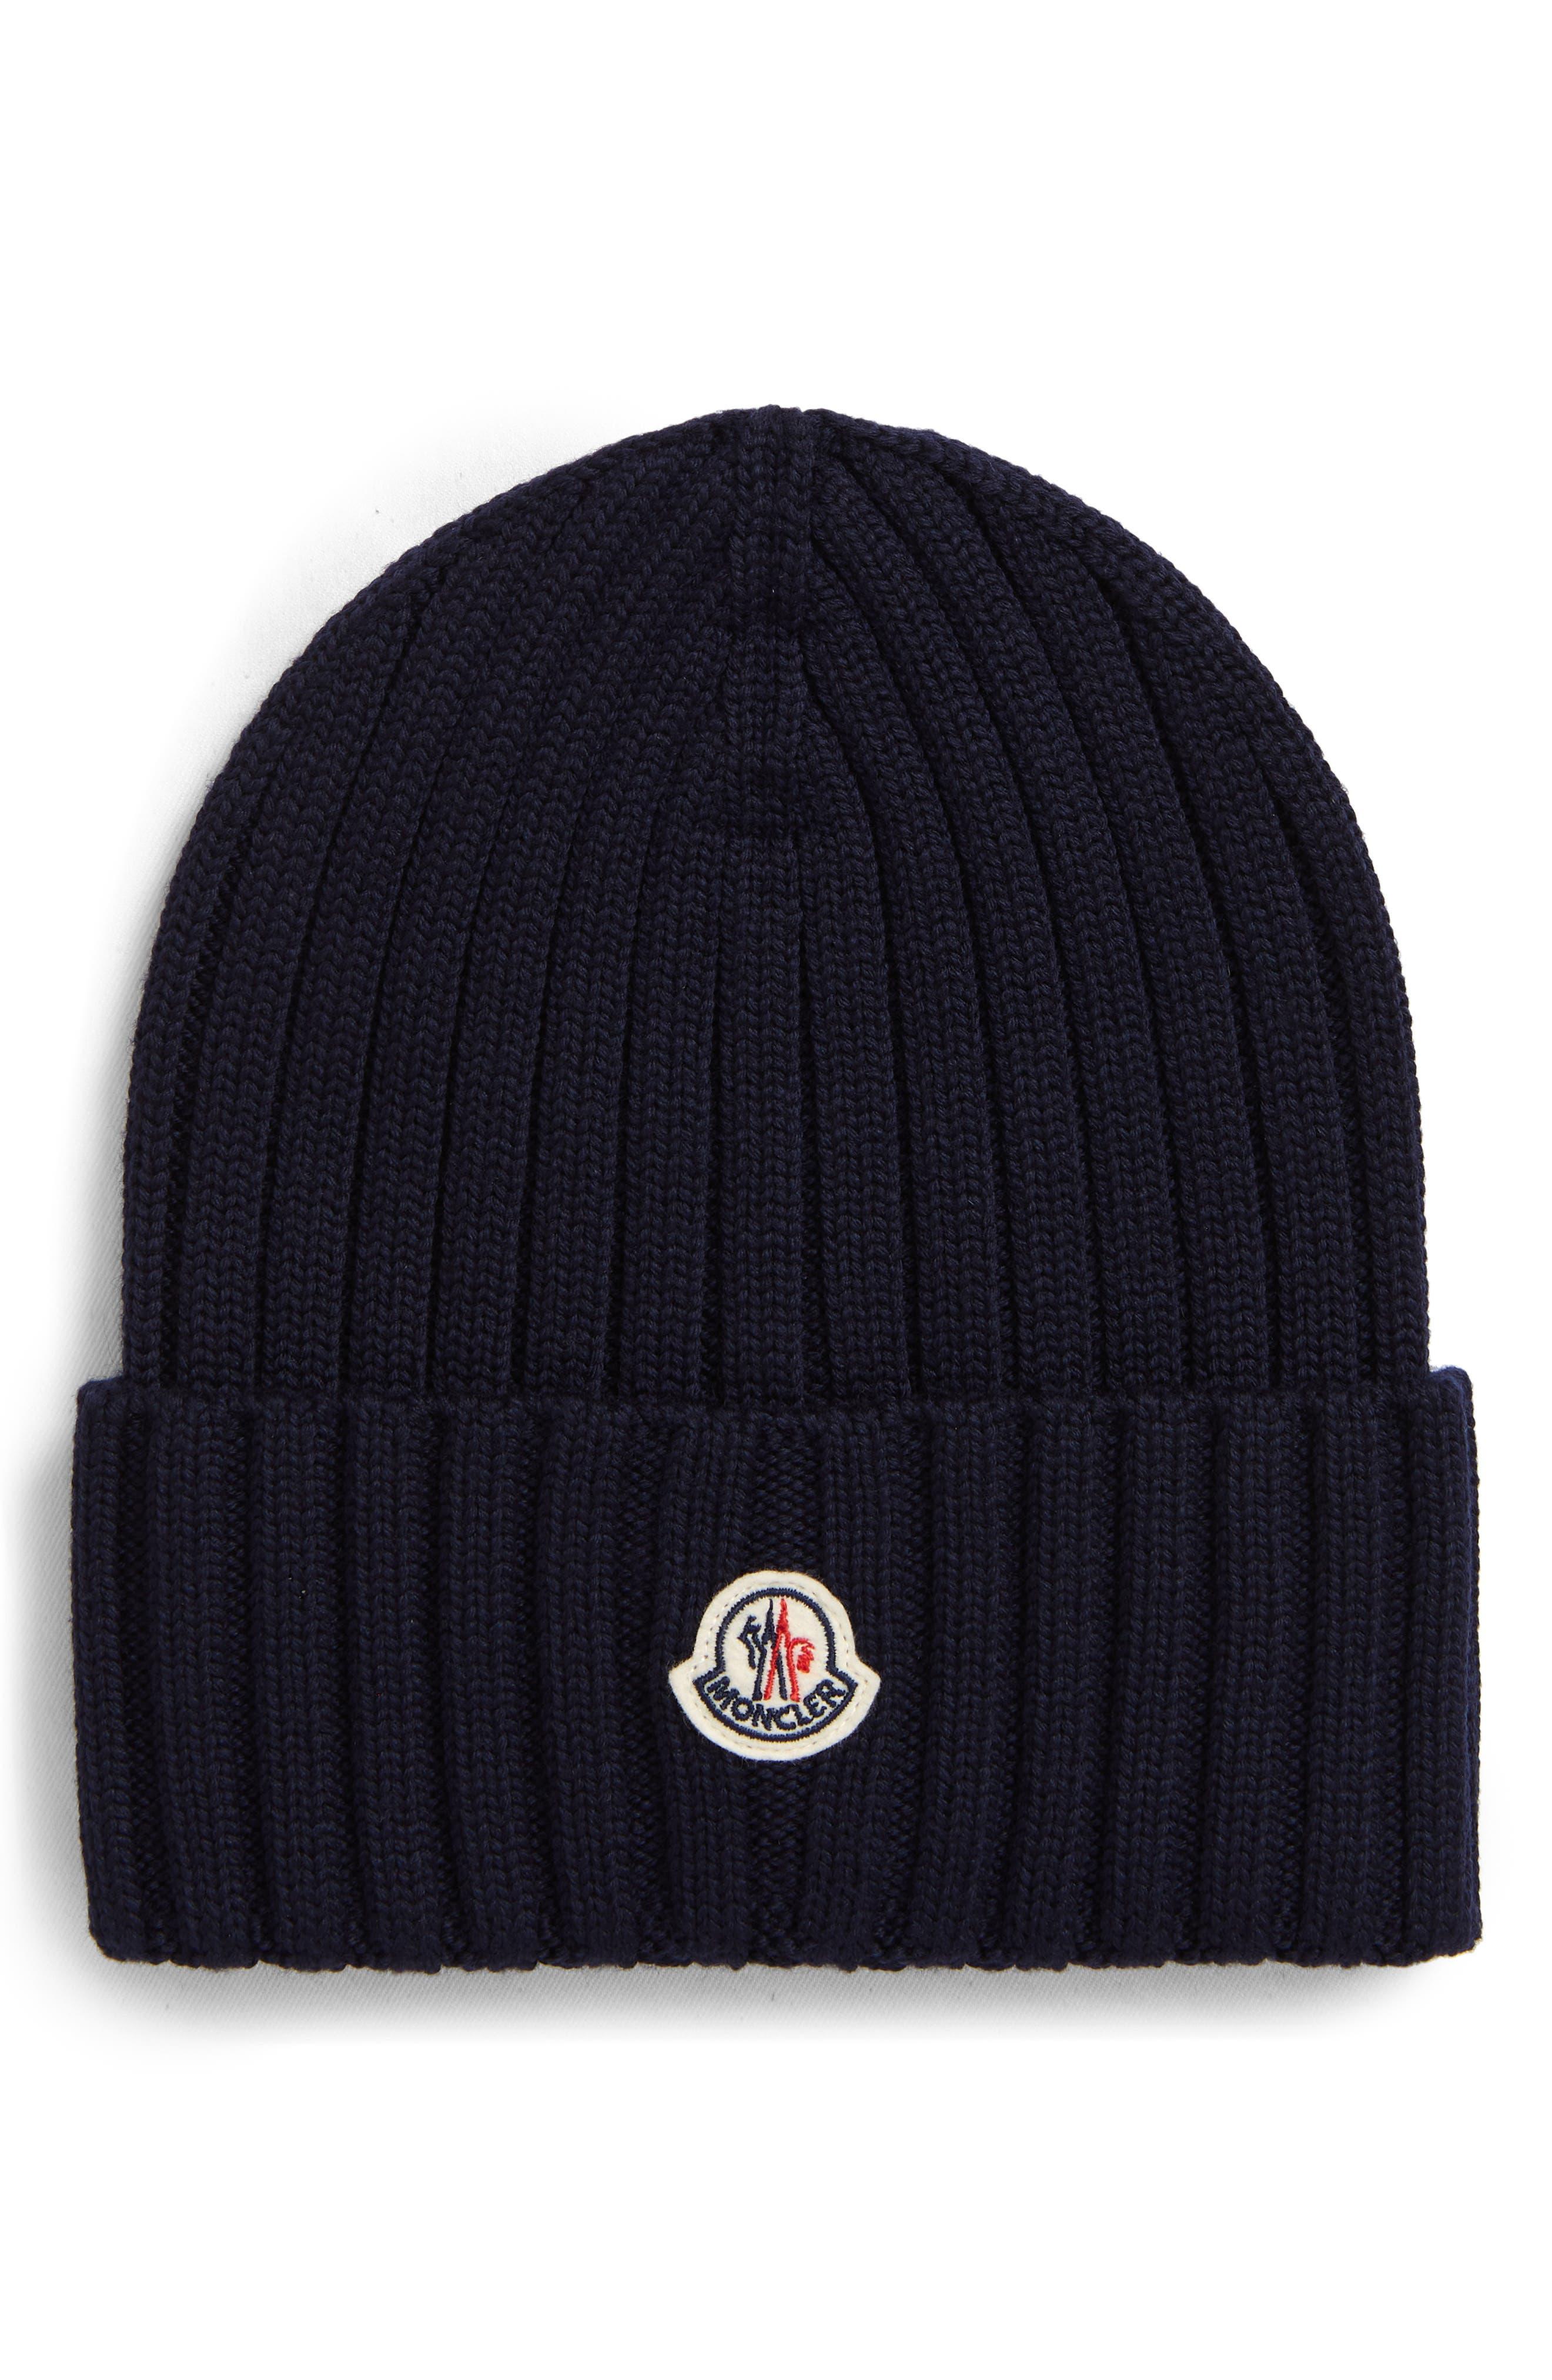 Women's Moncler Logo Rib Virgin Wool Beanie - Black